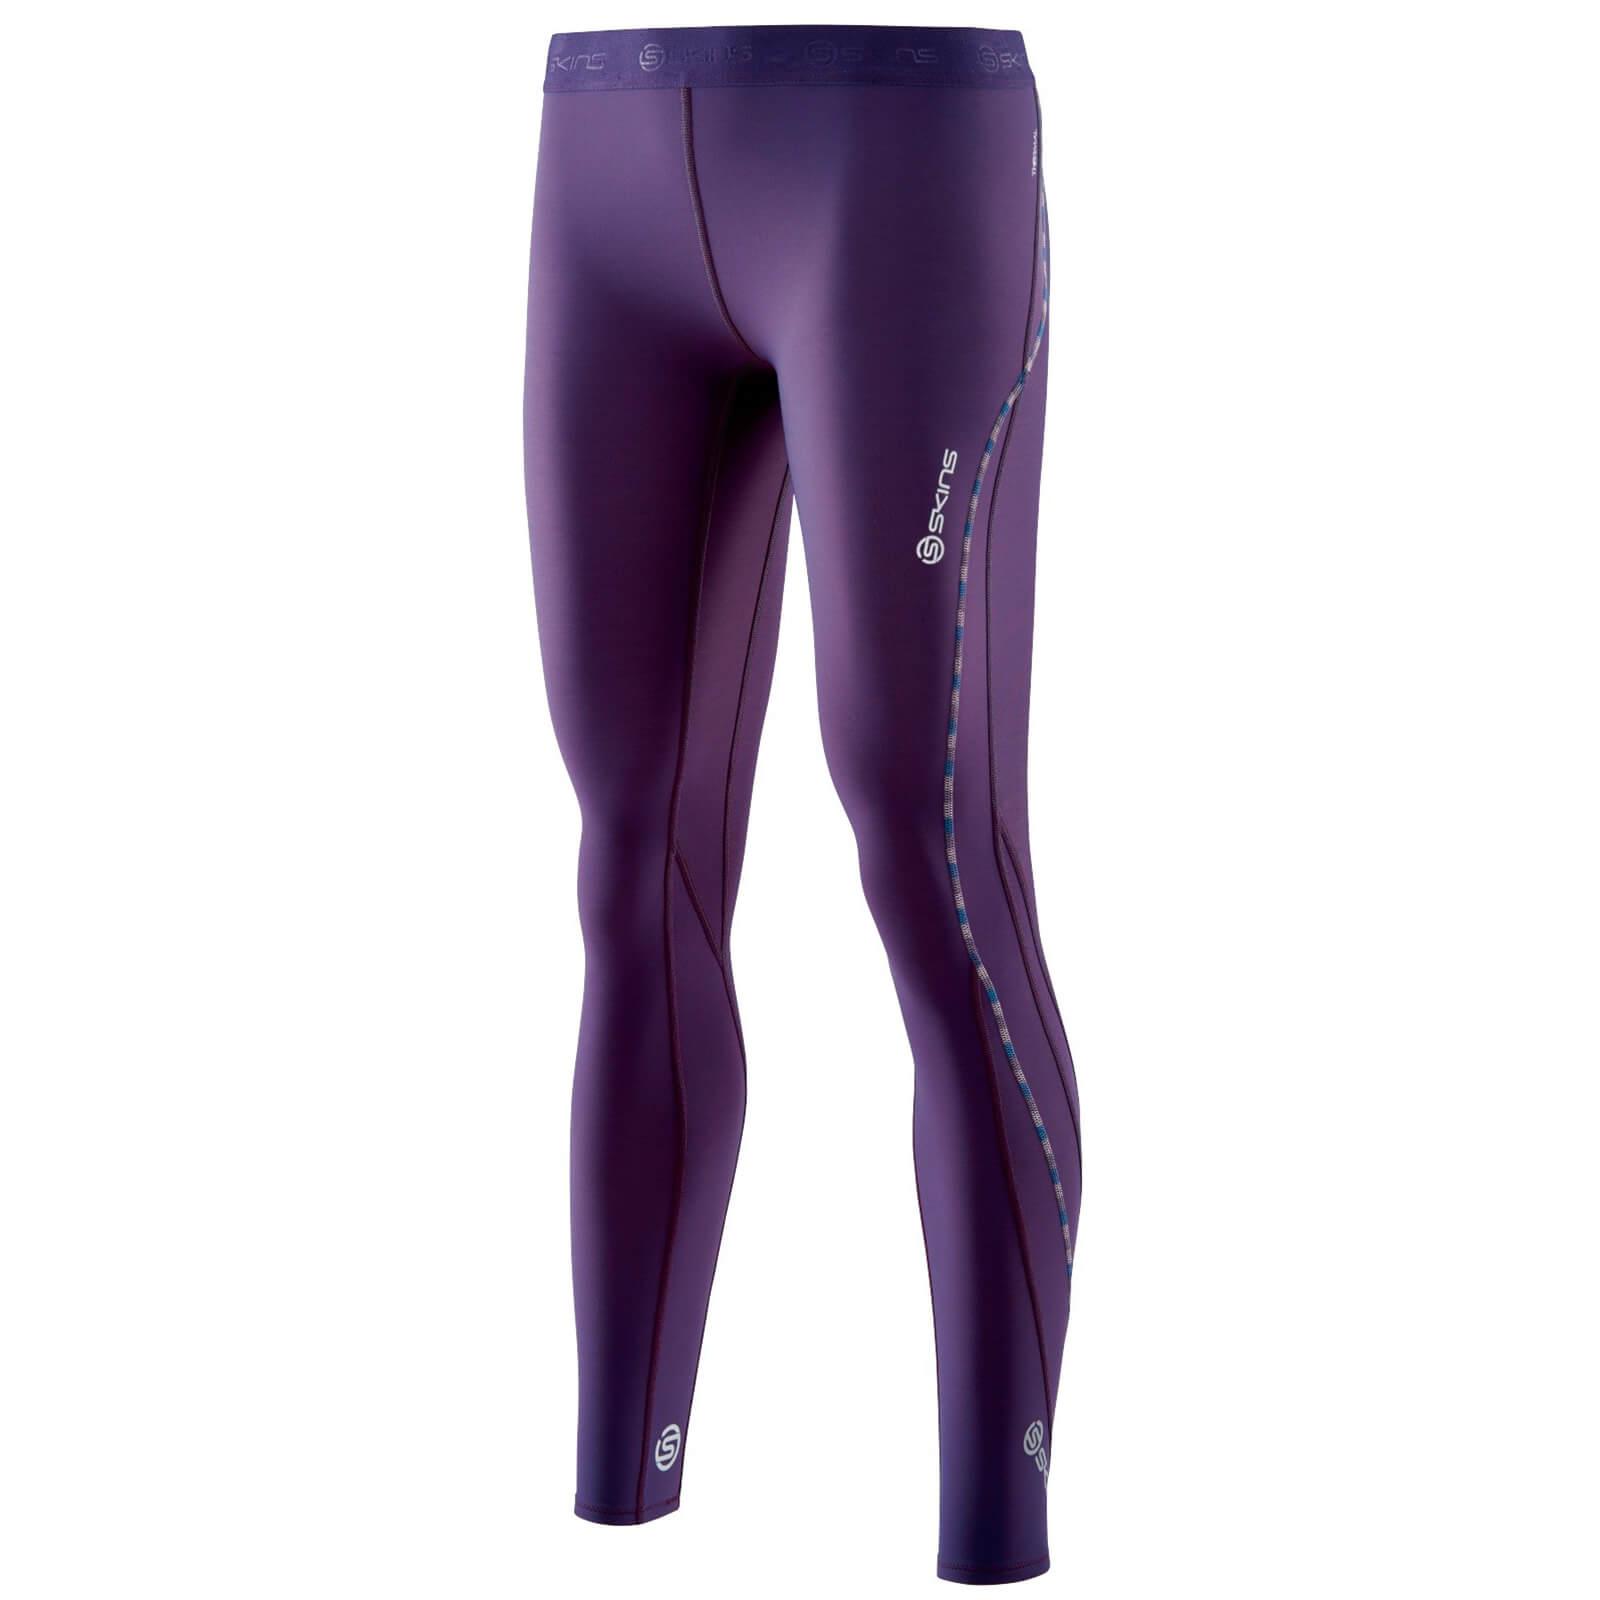 0f90f6b752 Skins Women's DNAmic Thermal Long Tights - Purple Sports & Leisure |  TheHut.com